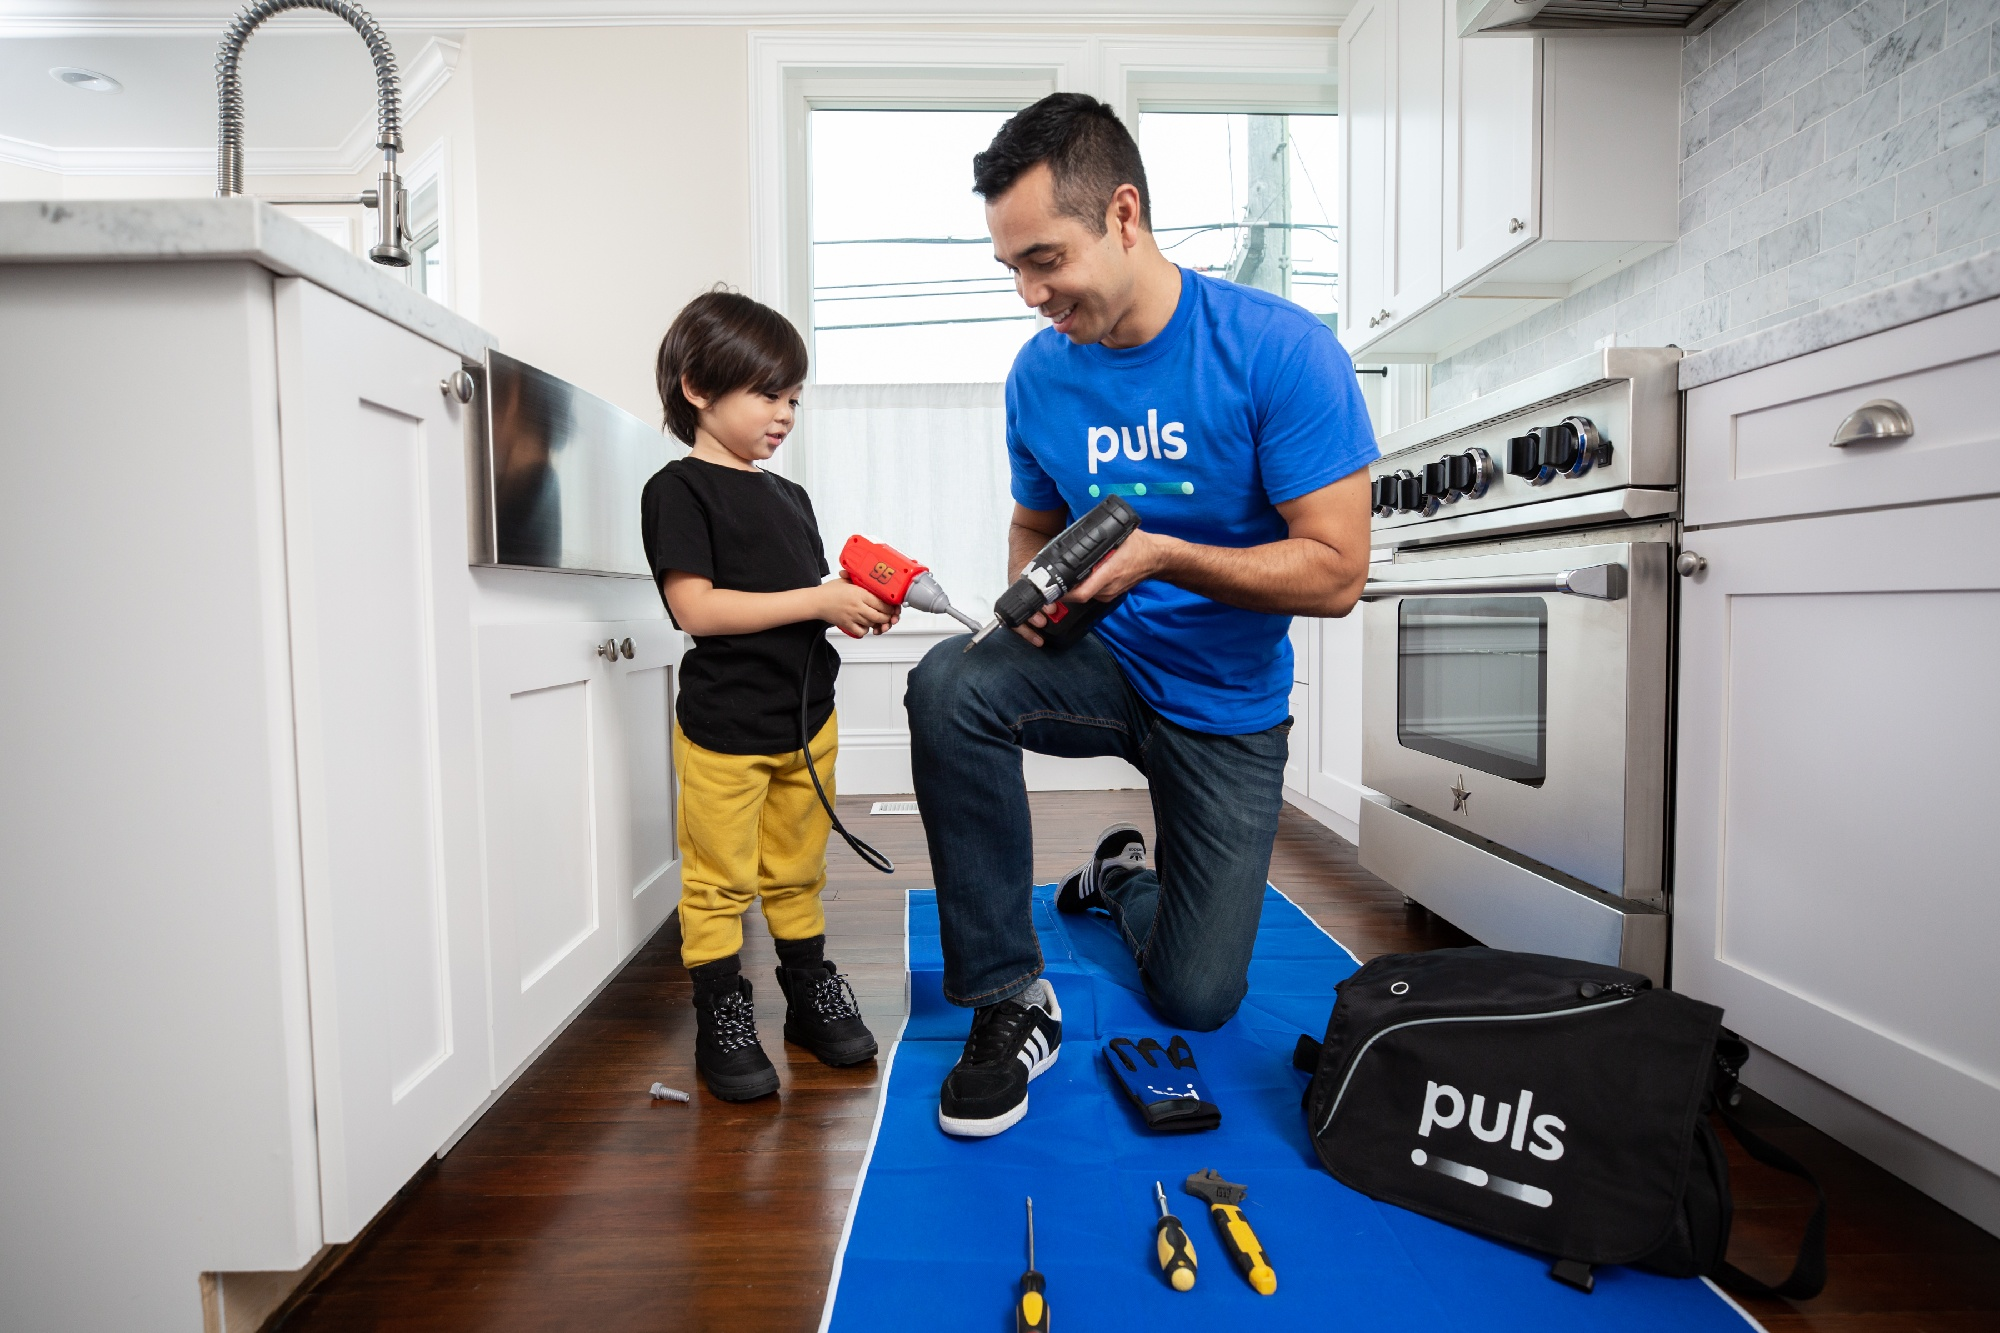 Puls appliance repair technician